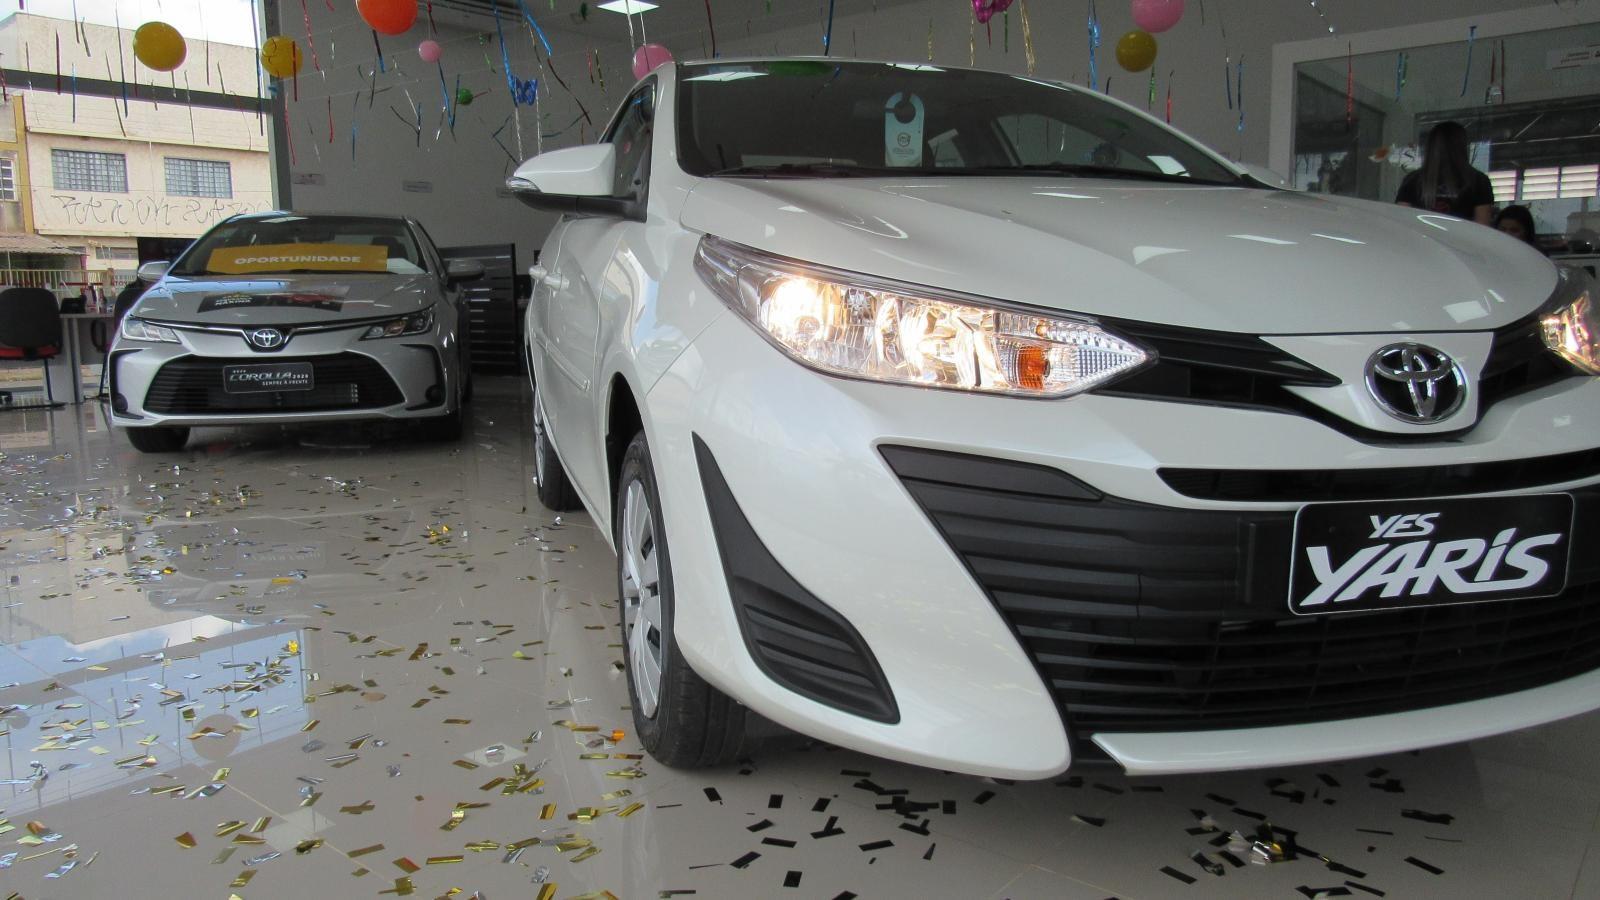 //www.autoline.com.br/carro/toyota/yaris-15-xls-connect-16v-flex-4p-automatico/2021/brasilia-df/12330841